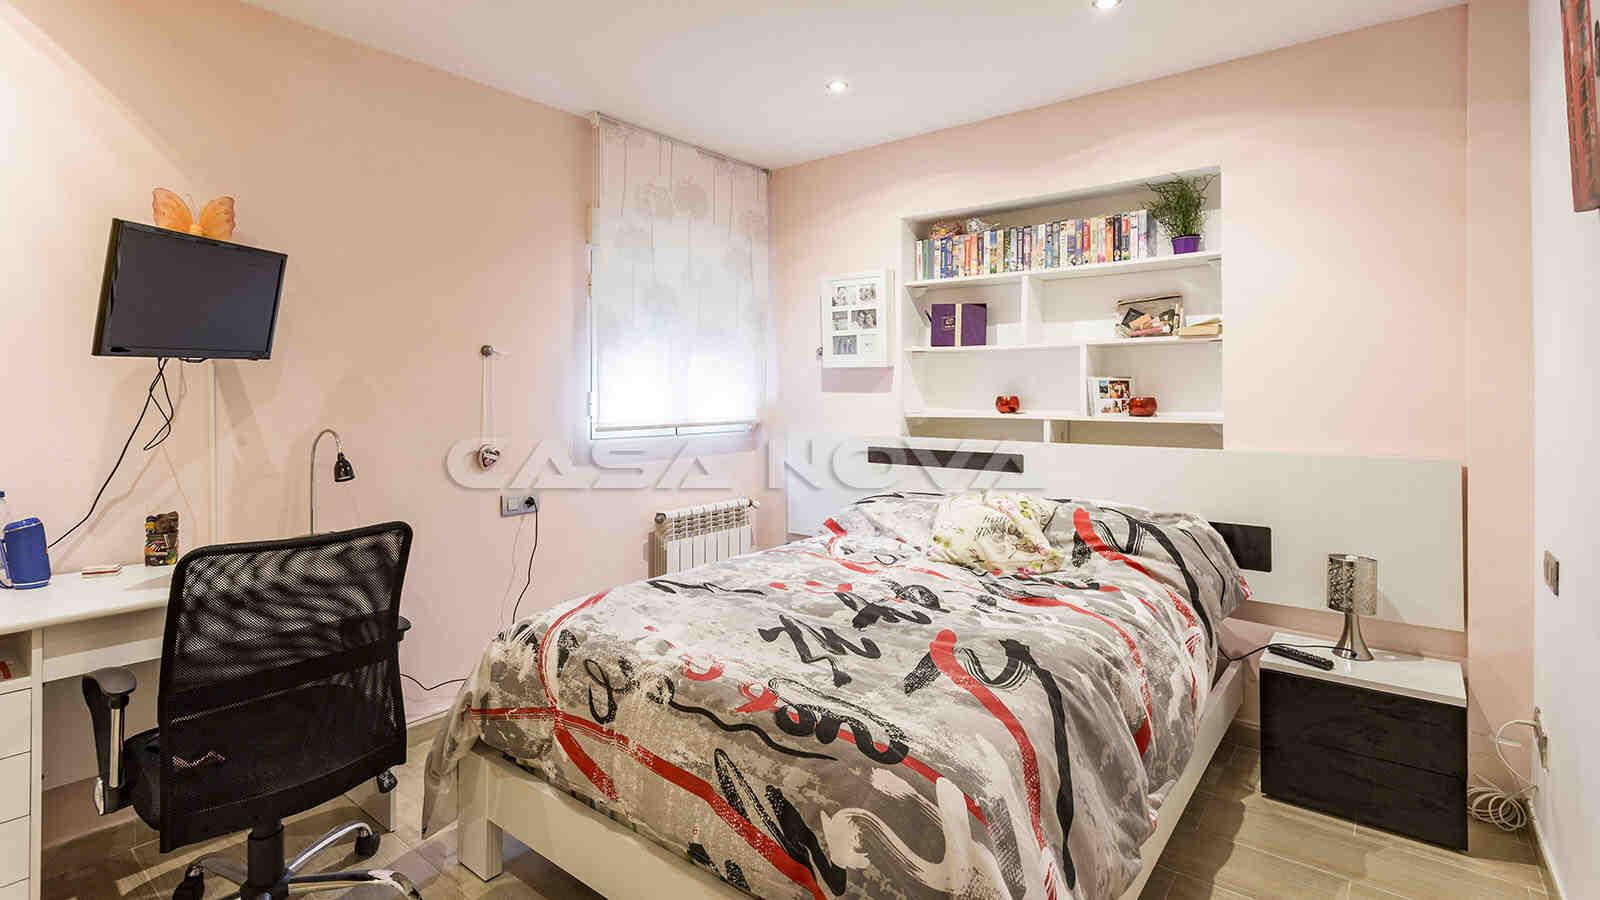 Drittes Schlafzimmer der Mallorca Immobilie